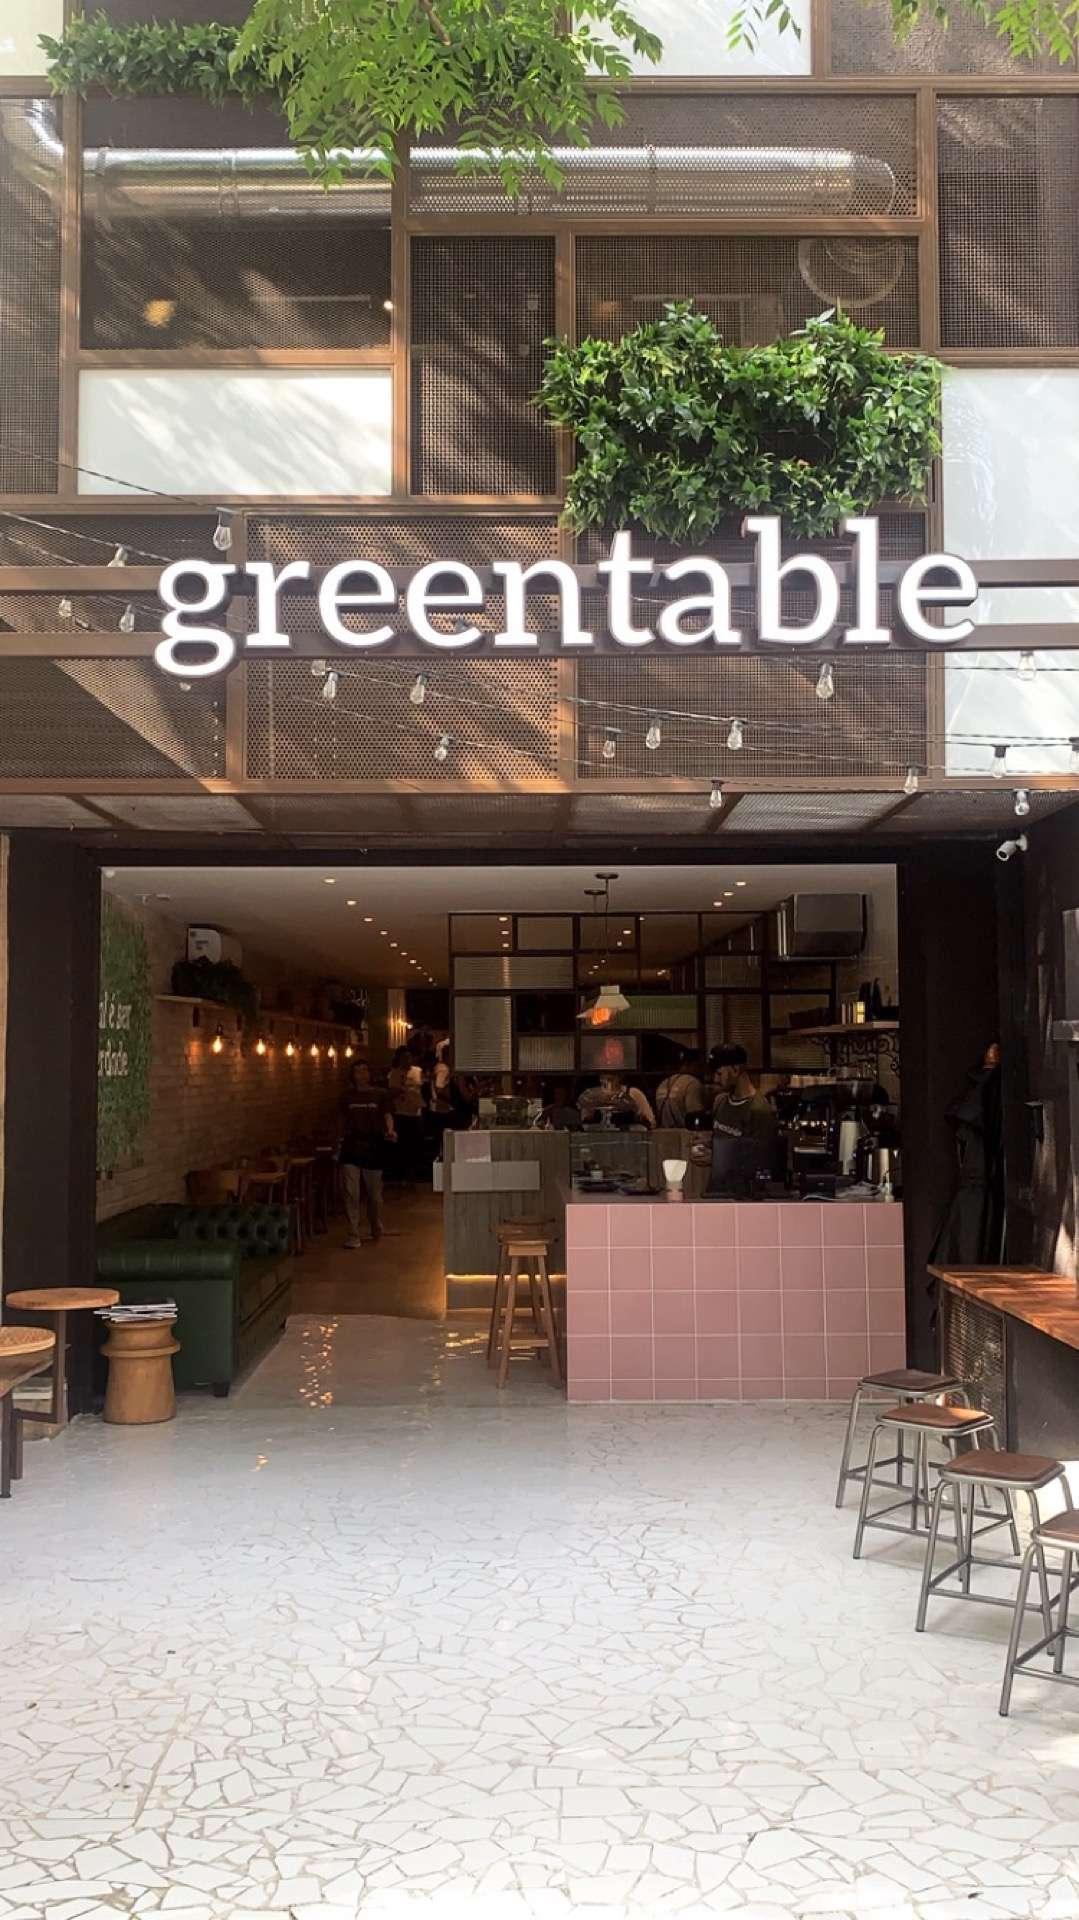 greentable em São Paulo | Shareeat